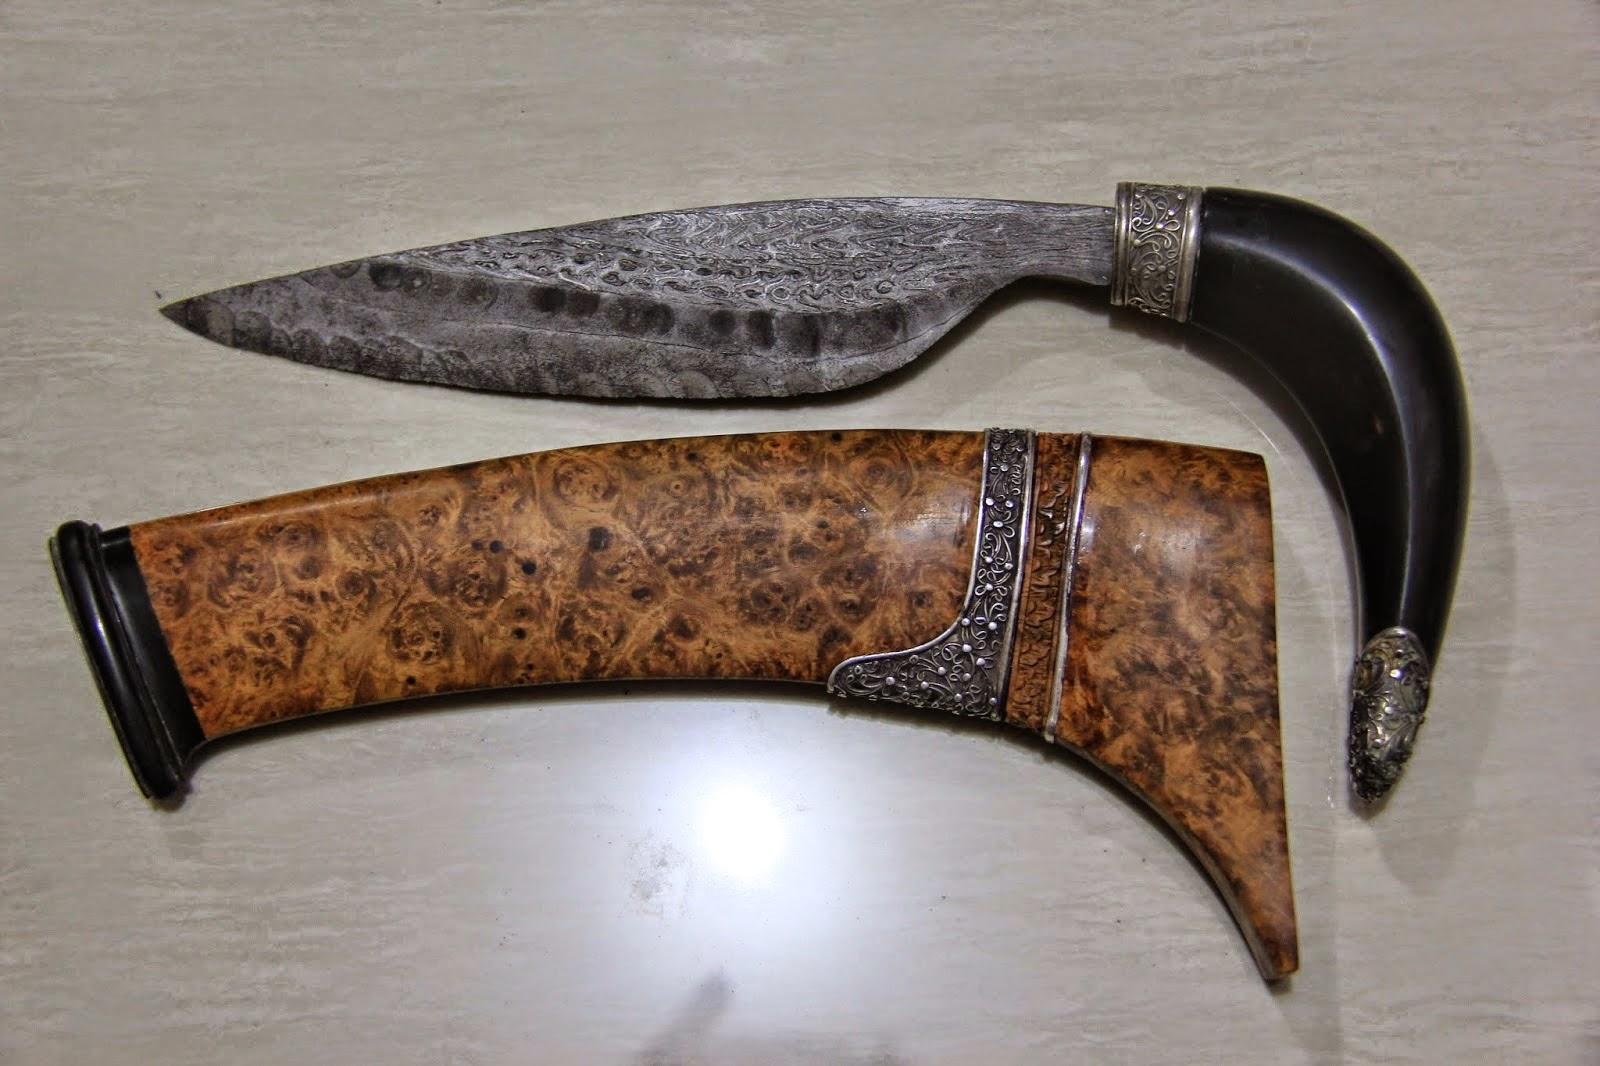 Sejarah Senjata Tradisional Badik Dan Jenisnya Bugis Makassar